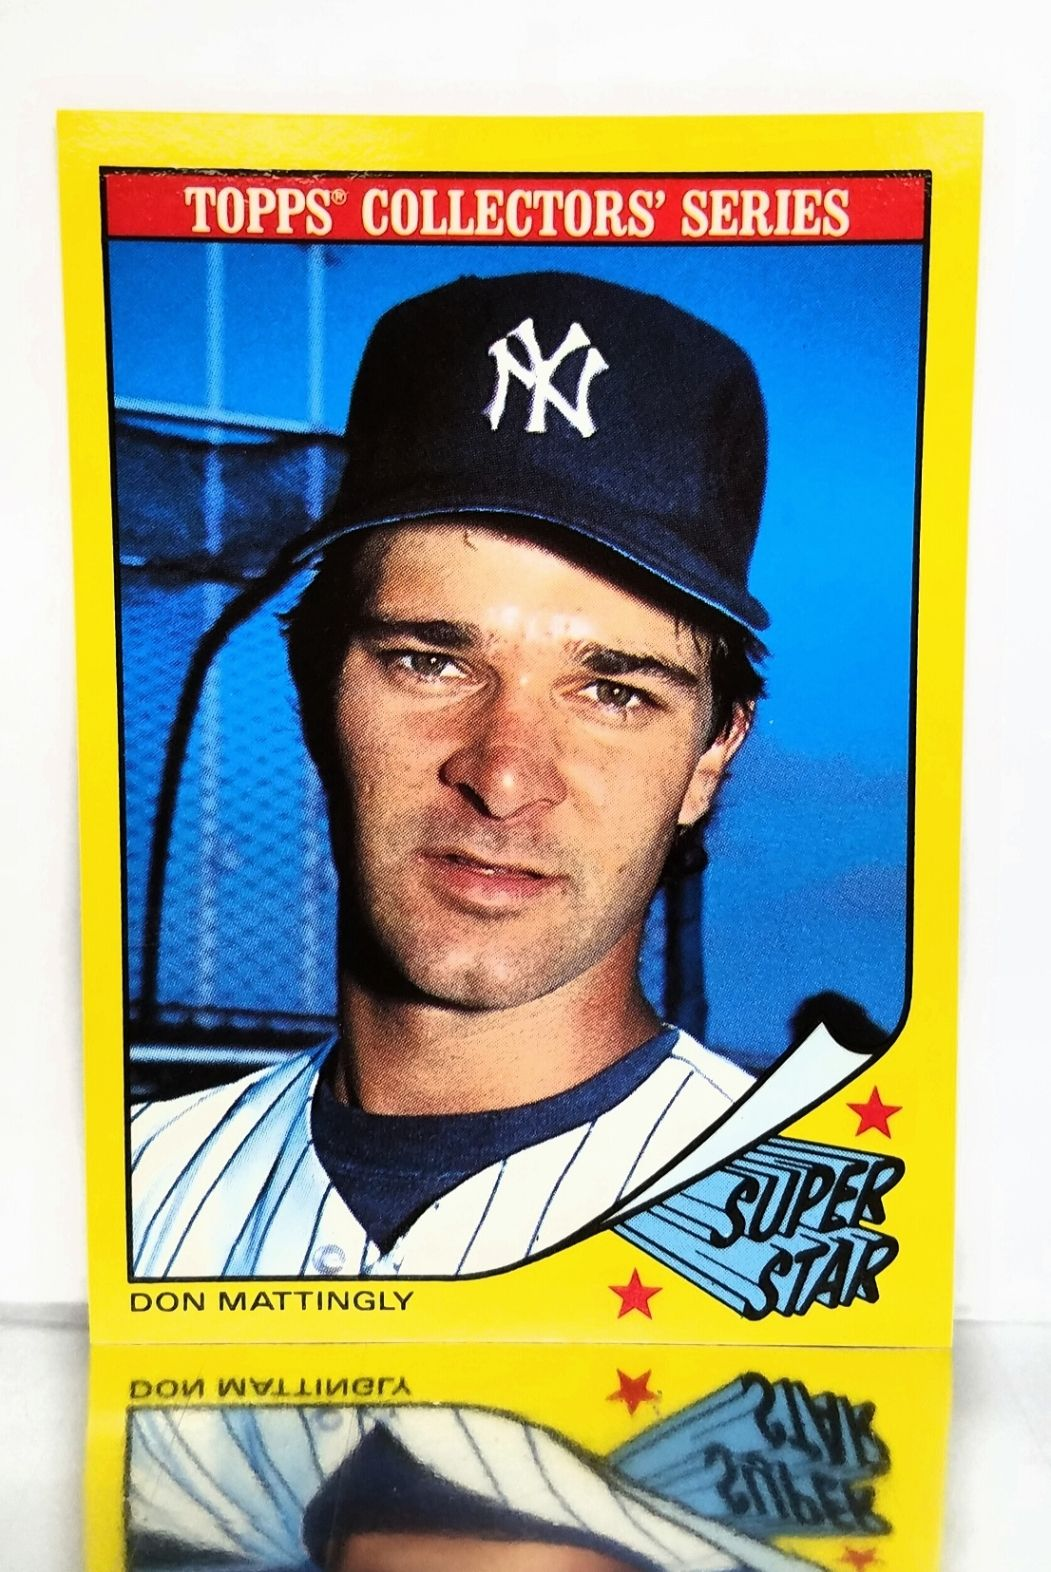 1986 topps superstar 20 don mattingly new york yankees